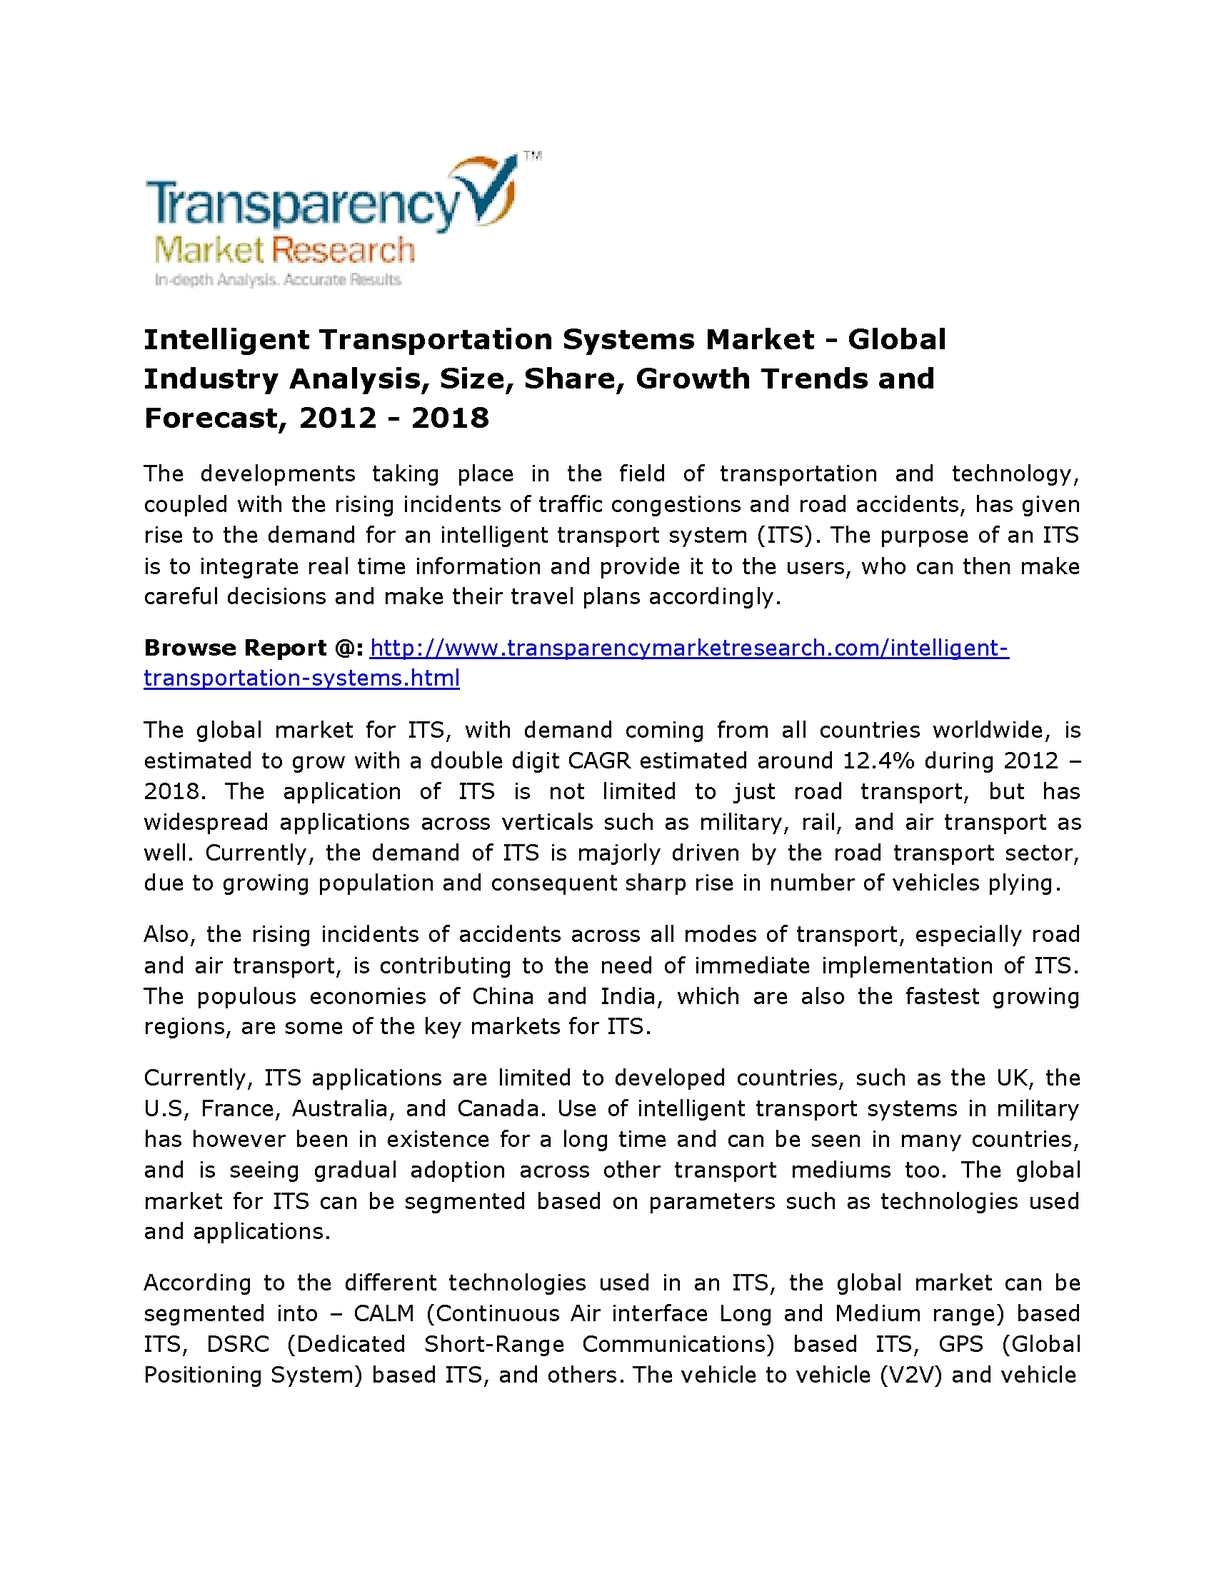 Calaméo - Intelligent Transportation Systems Market- Size